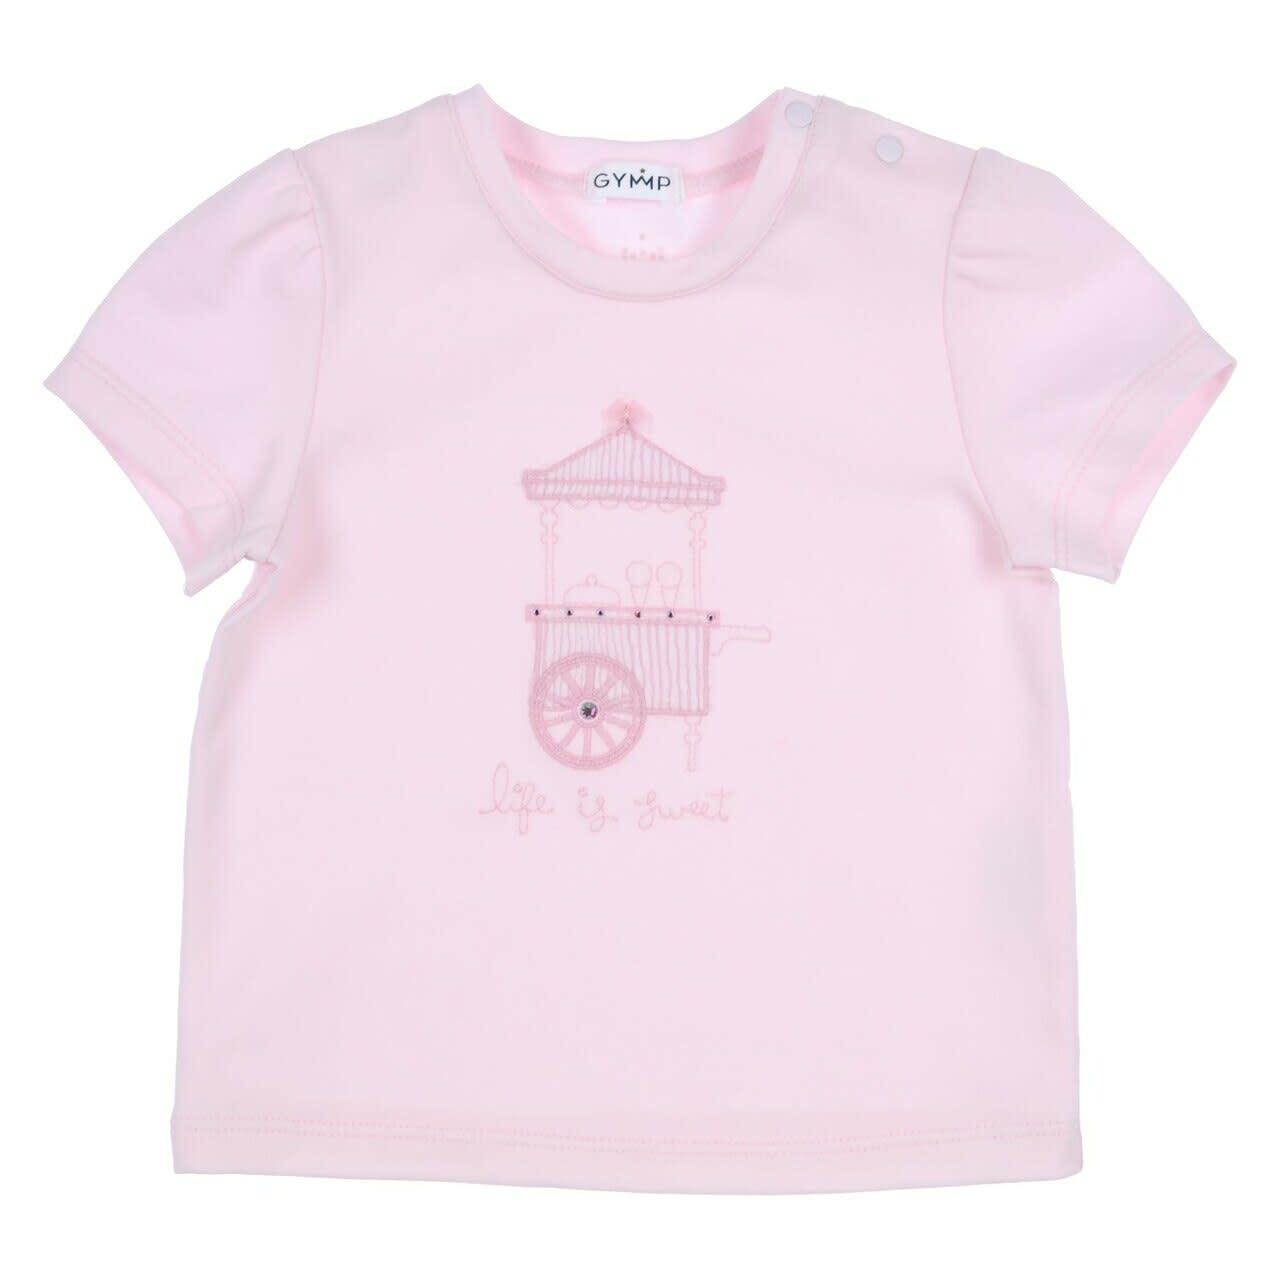 Gymp Gymp Life Is Sweet Ice Cream Tshirt 1108 S21